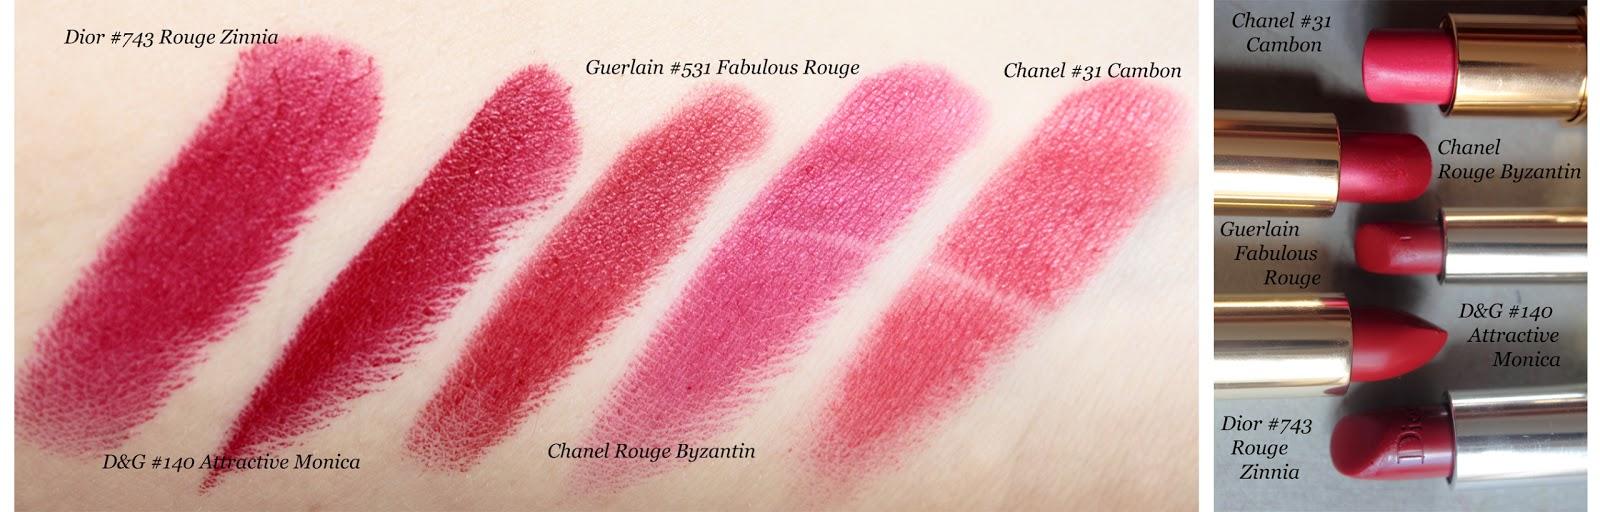 Gabbana dolce classic cream lipsticks spring best photo